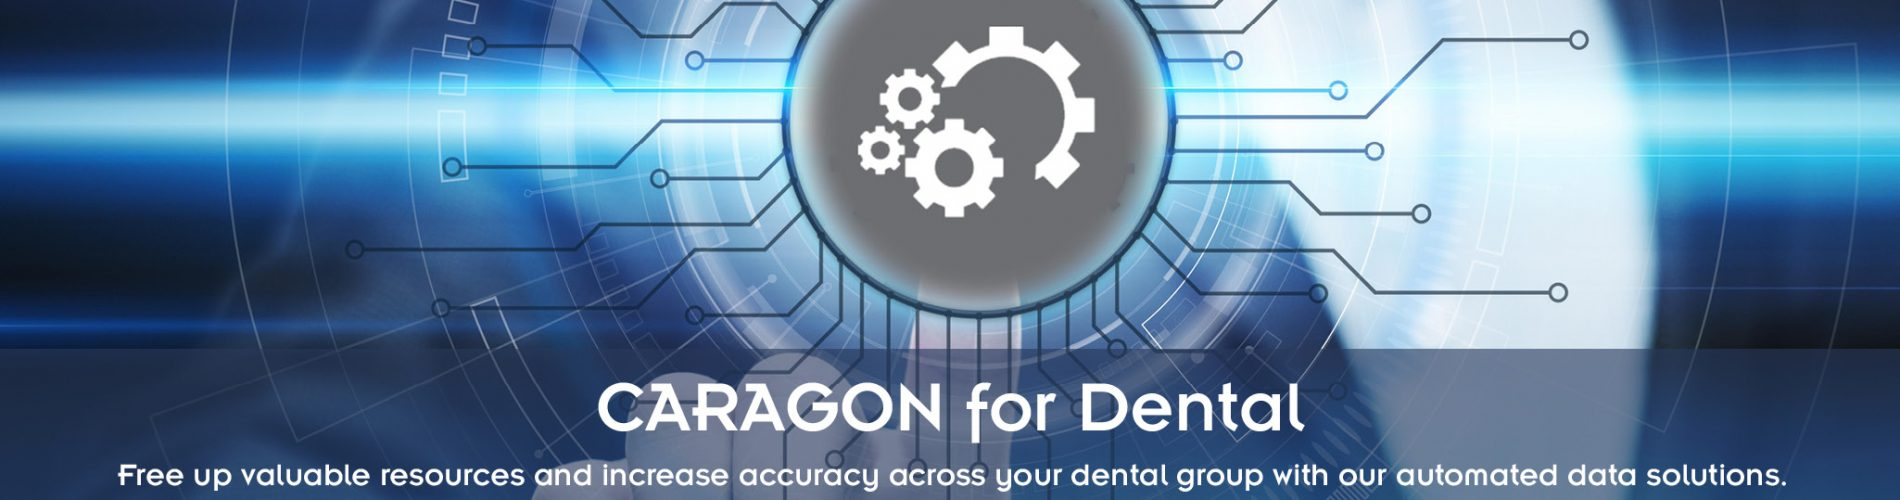 CARAGON for Dental